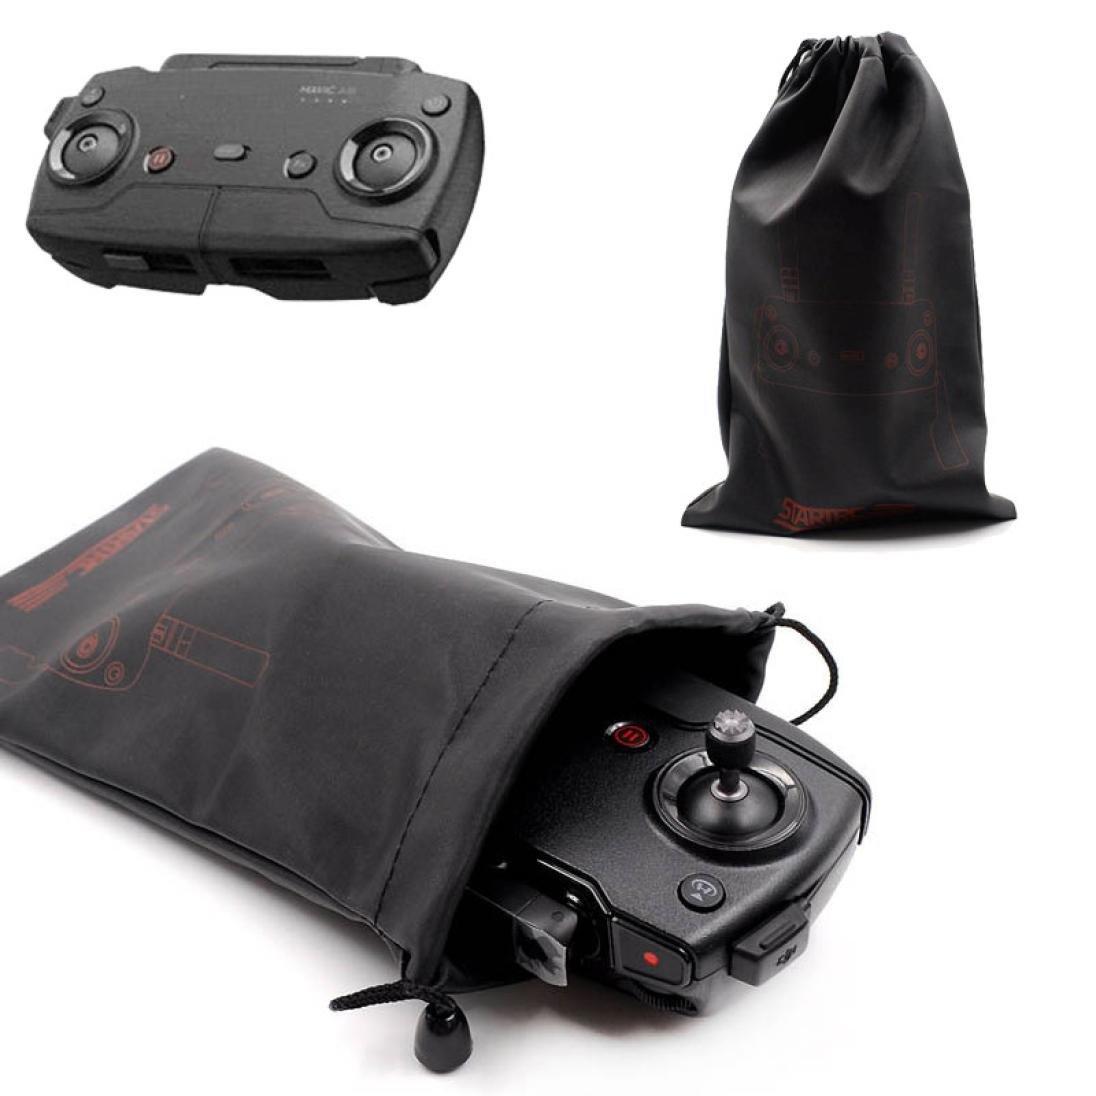 yuyoug mando a distancia impermeable para funda de transporte bolsa protectora Para DJI Mavic aire